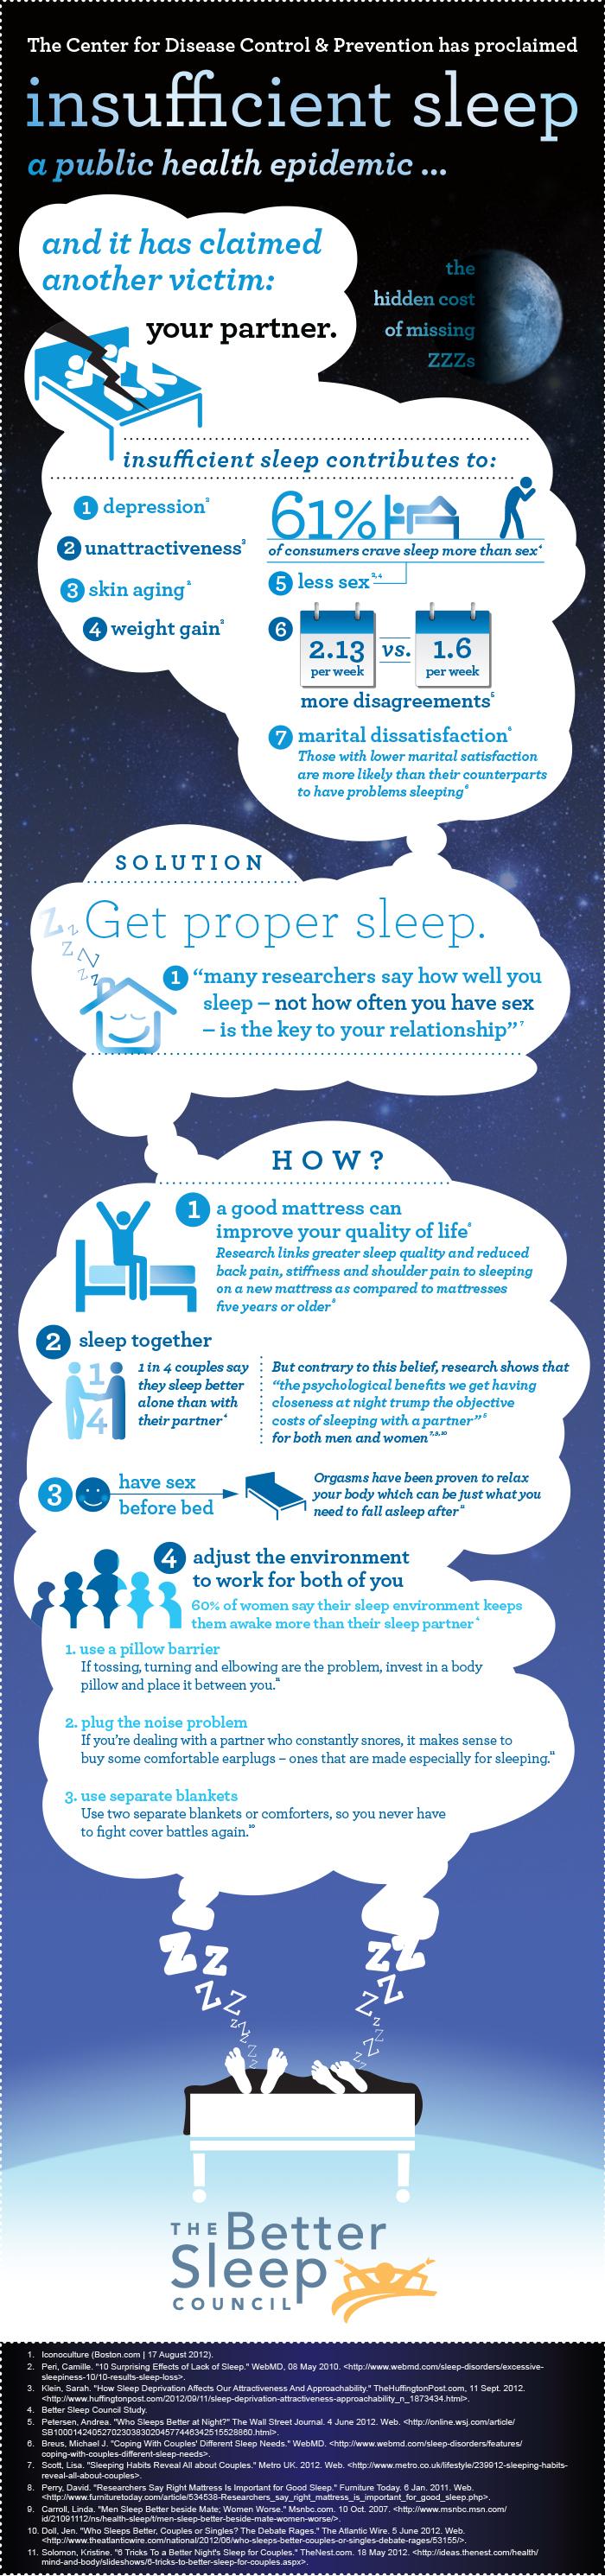 Better Sleeping Solutions